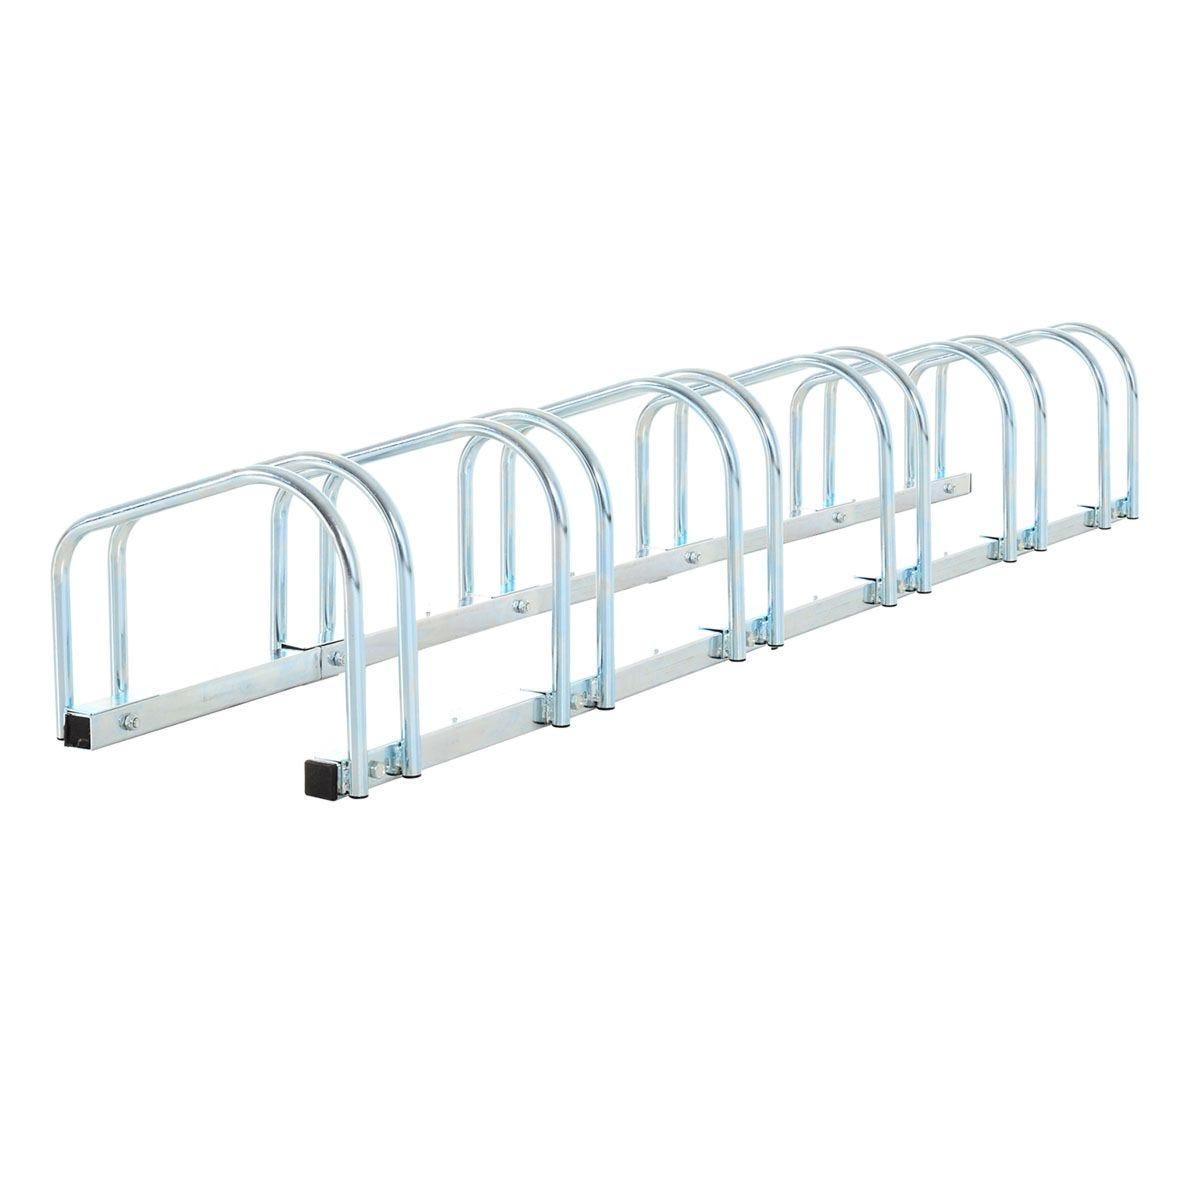 HOMCOM 6 Bike Parking Rack Locking Storage Stand Holder Outdoor Floor Wall Mount Steel - Silver